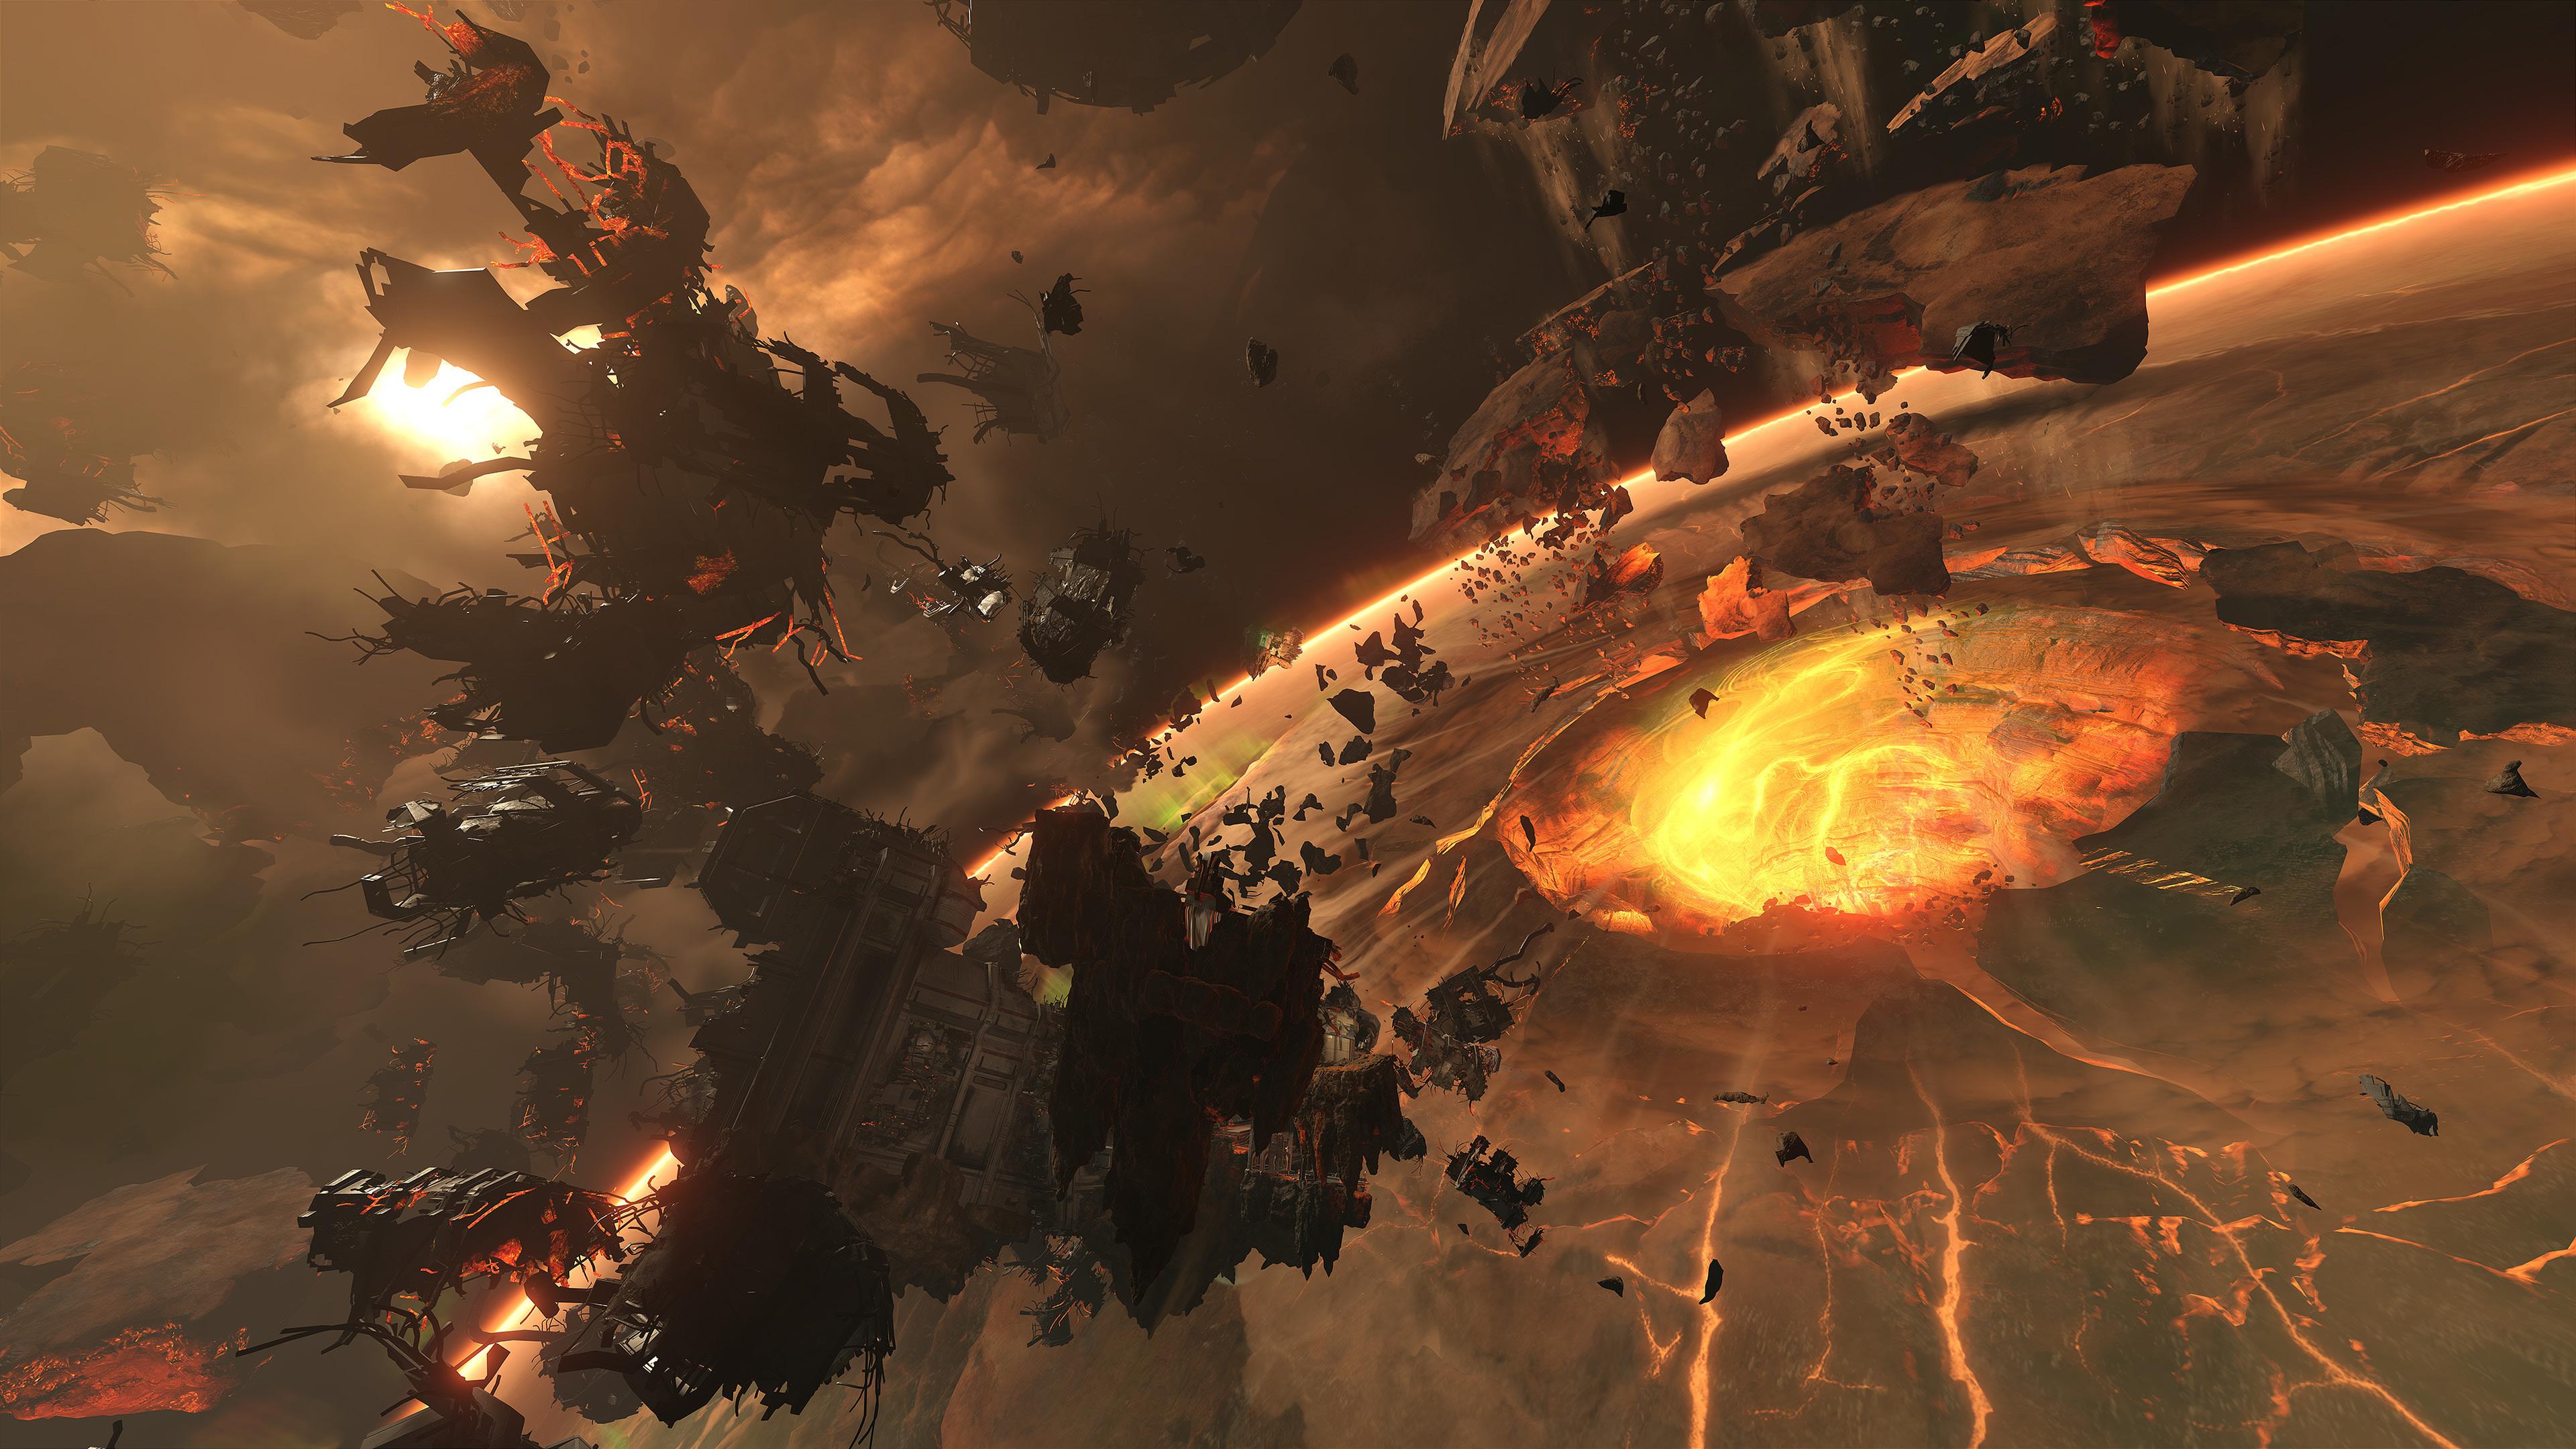 Doom Eternal 4k Ultra Hd Wallpaper Background Image 3840x2160